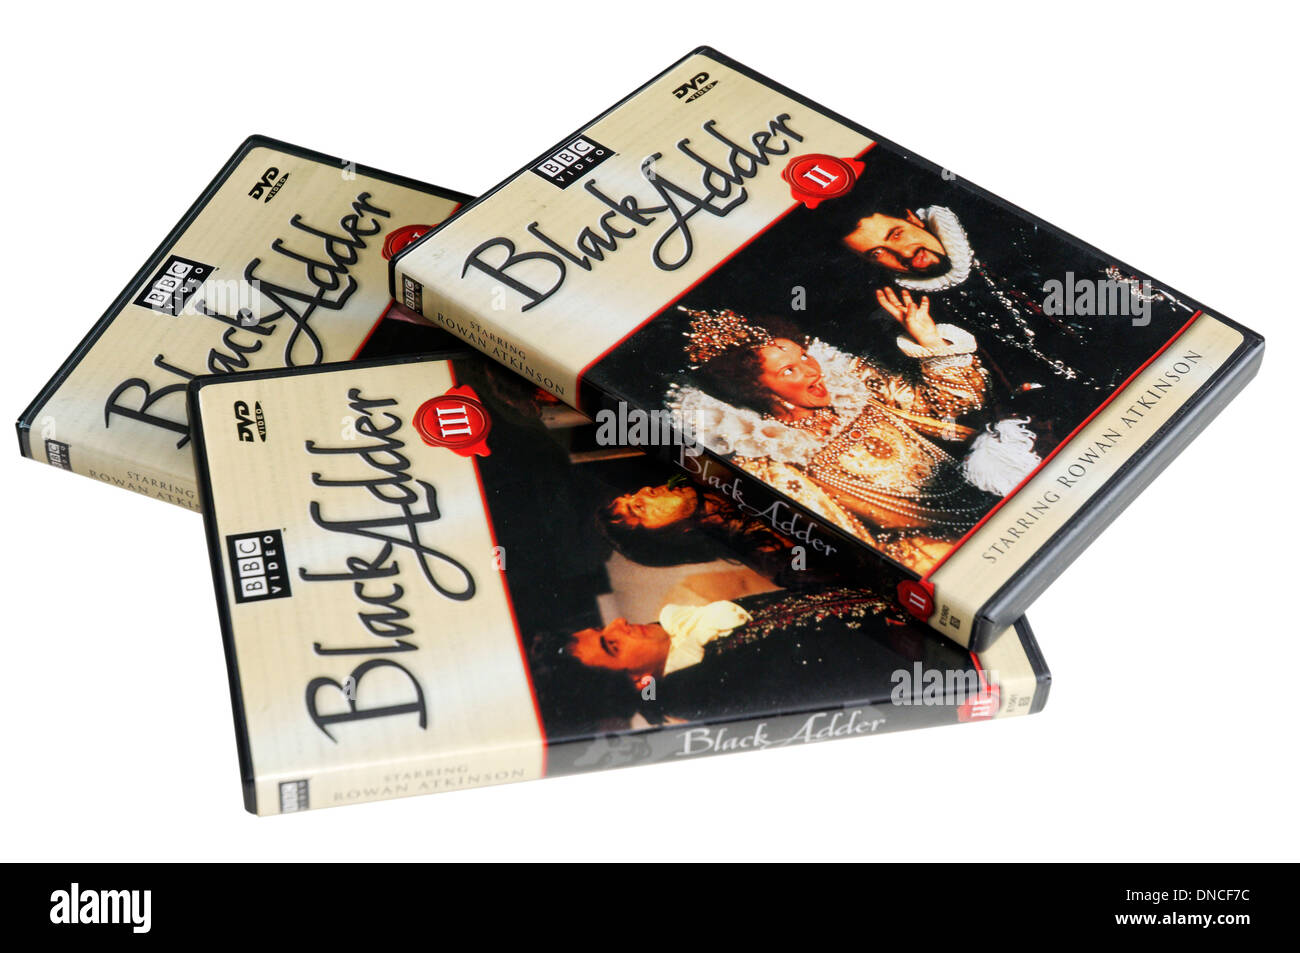 Blackadder BBC TV Comedy classics DVD - Stock Image